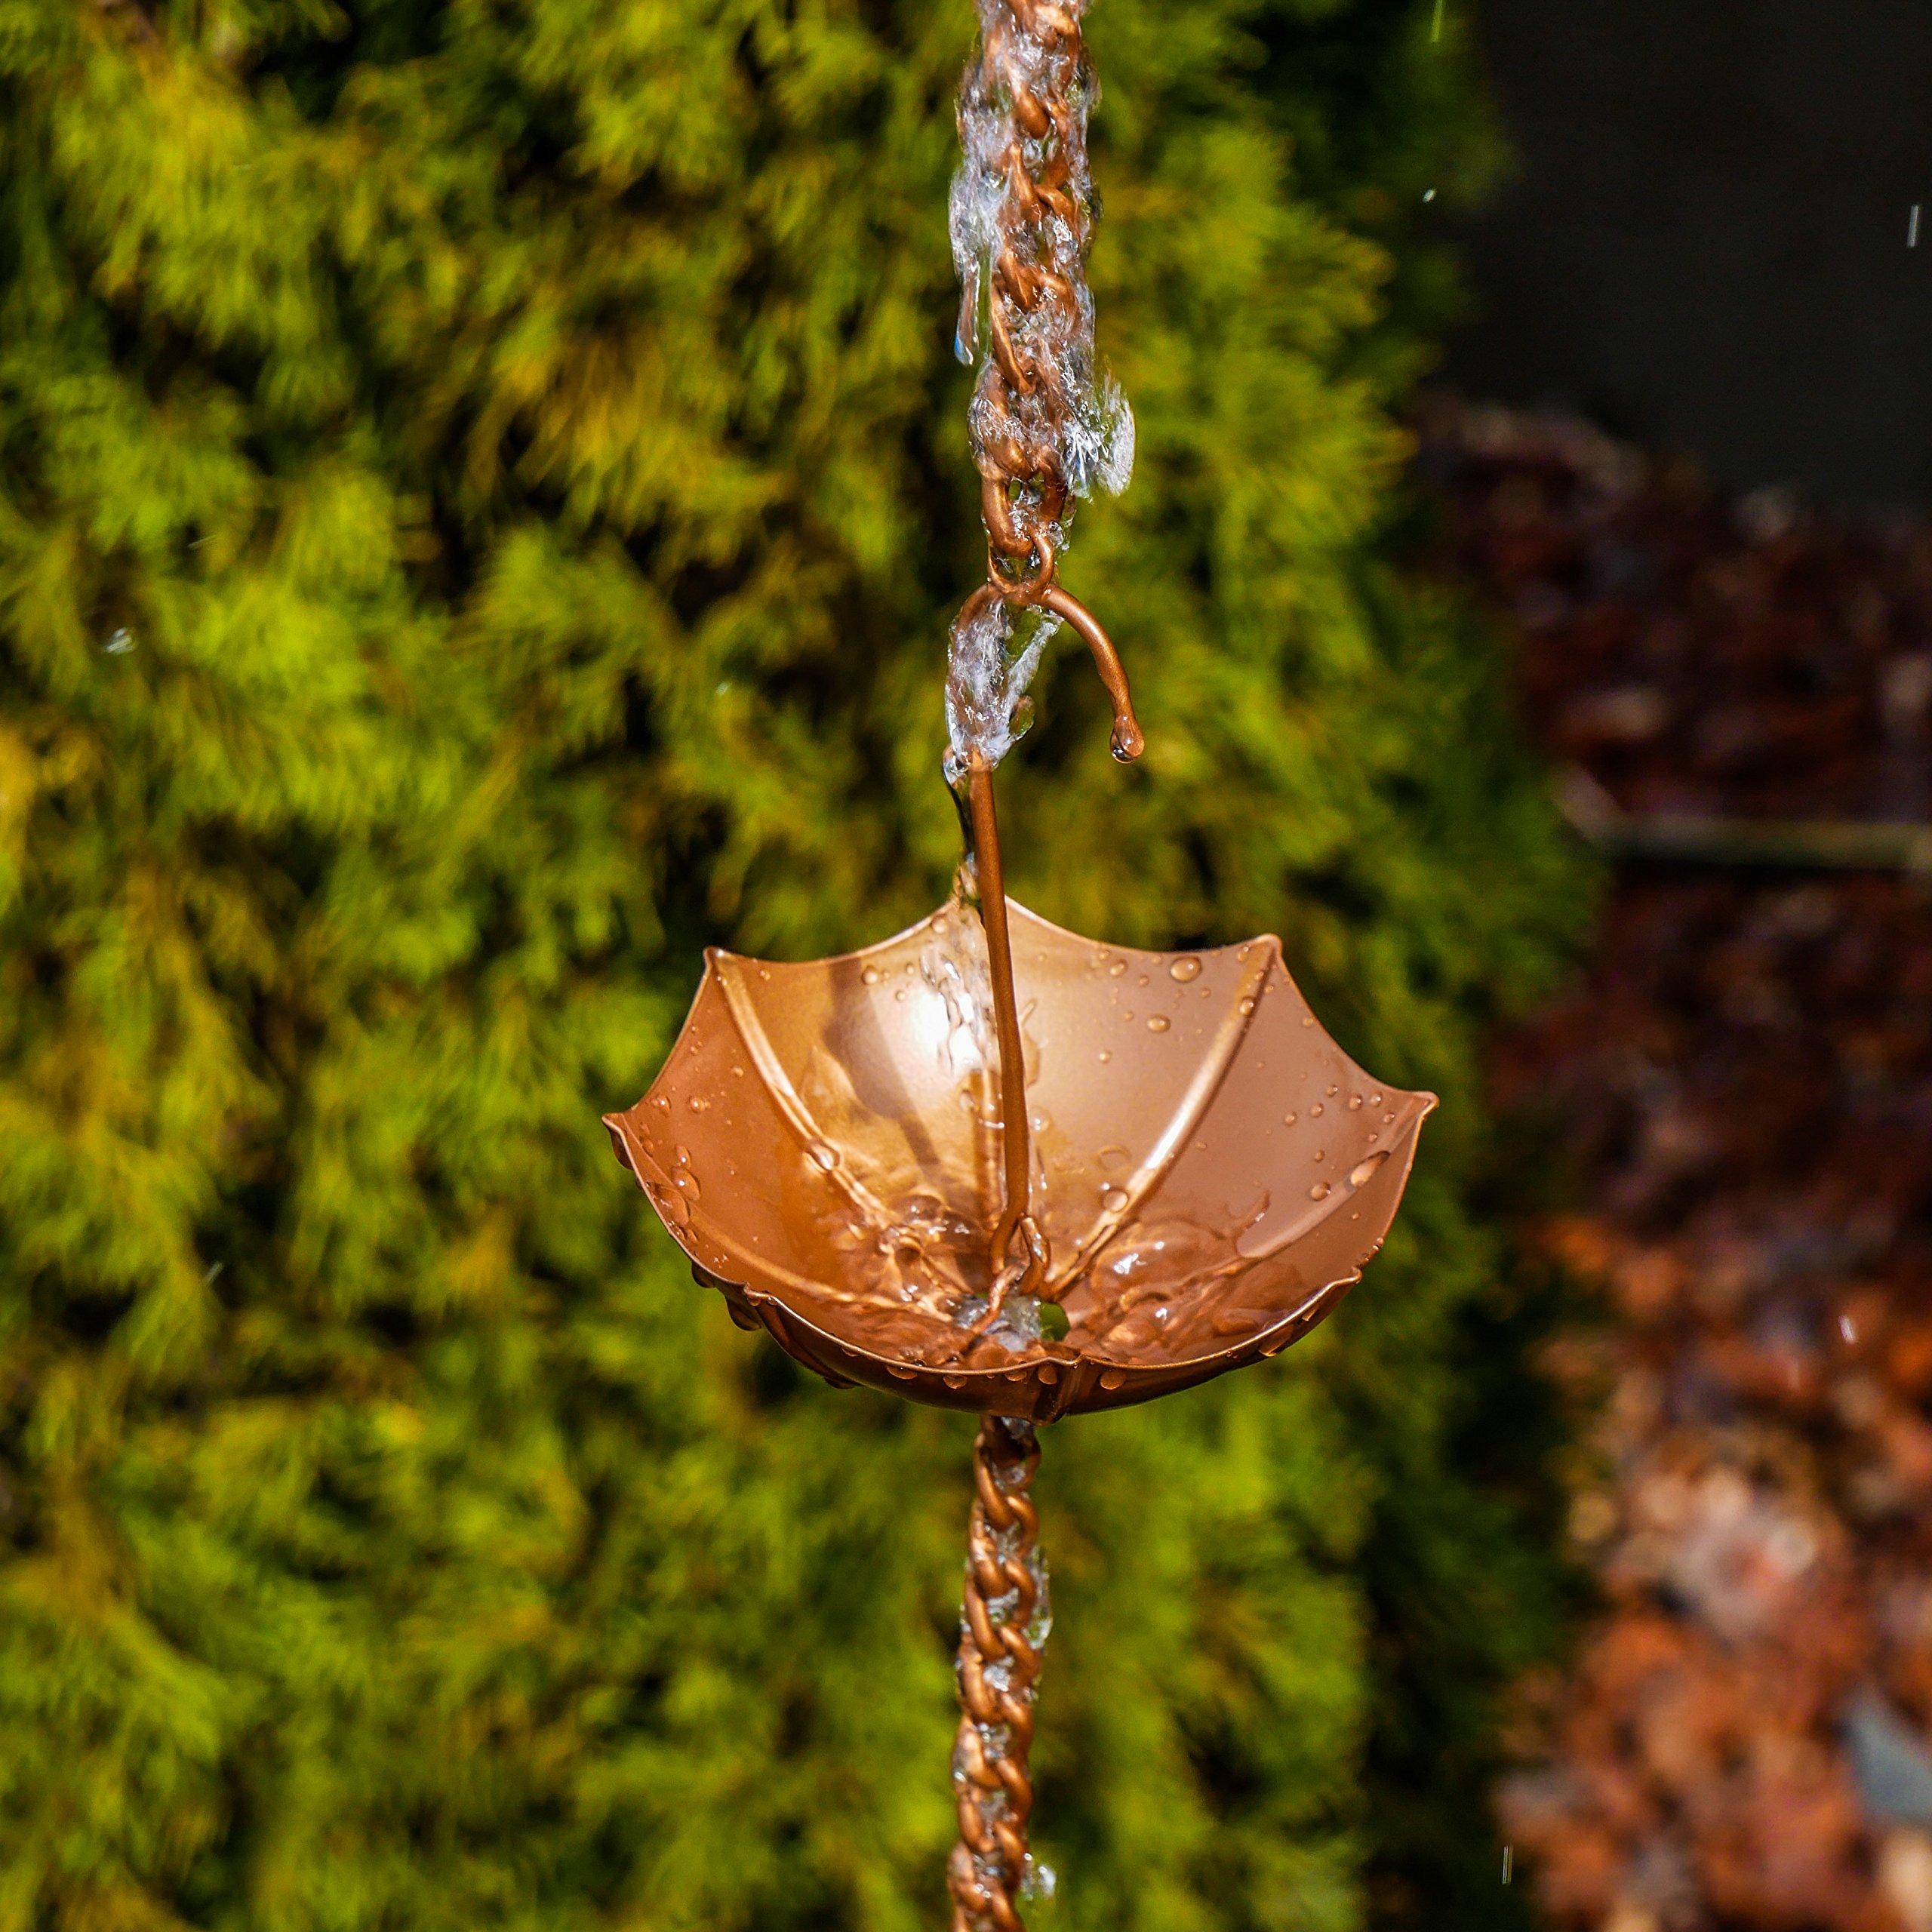 Umbrella rain chain with water running down it